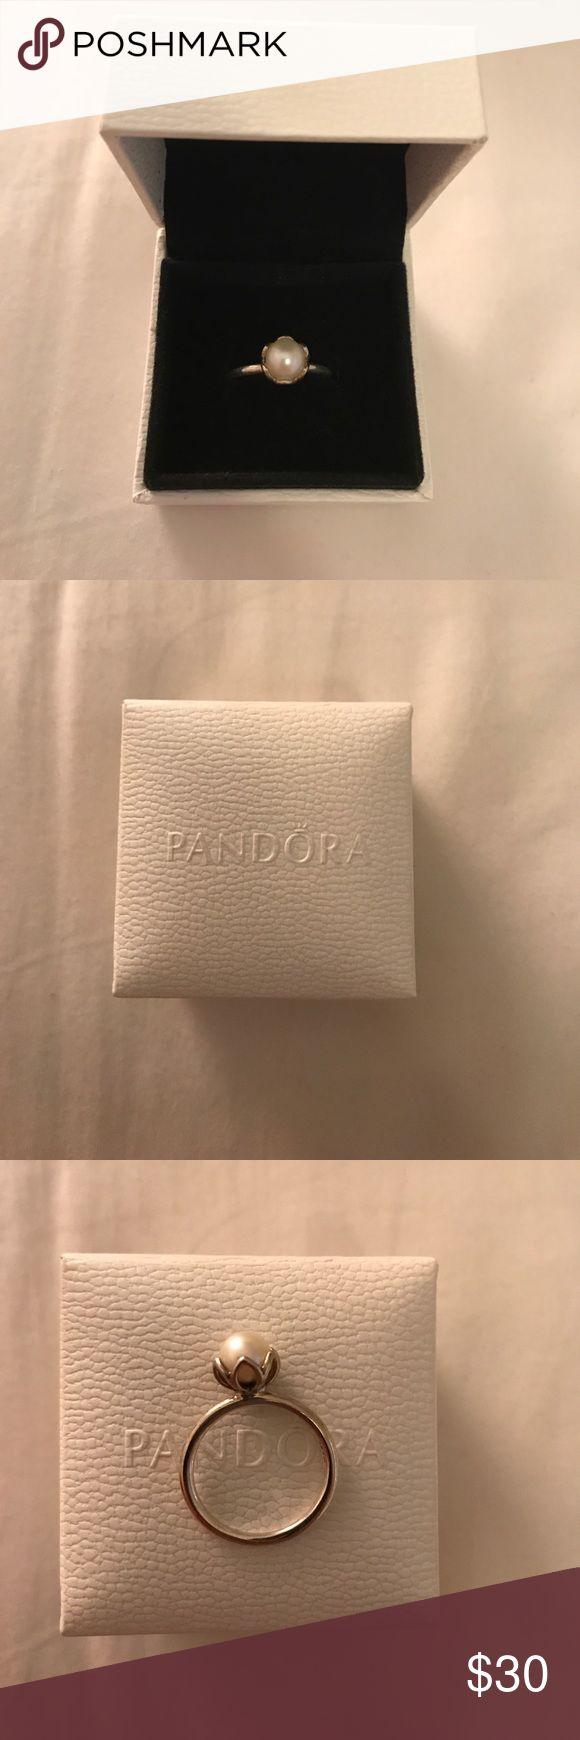 Pandora pearl ring Size 5 pearl ring from Pandora Pandora Jewelry Rings